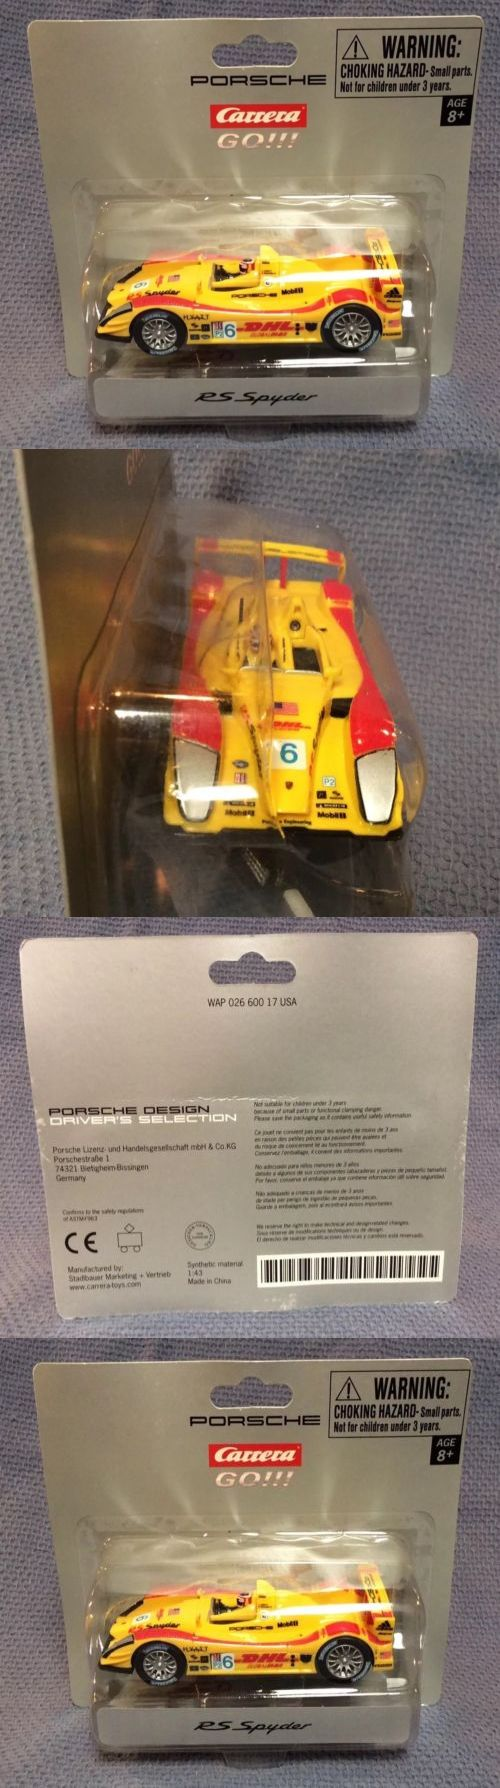 Carrera Go Slot Car 1 43 Scale Prototype Lemans Race Porsche Rs Spyder Rare 6 Slot Cars Porsche Carrera